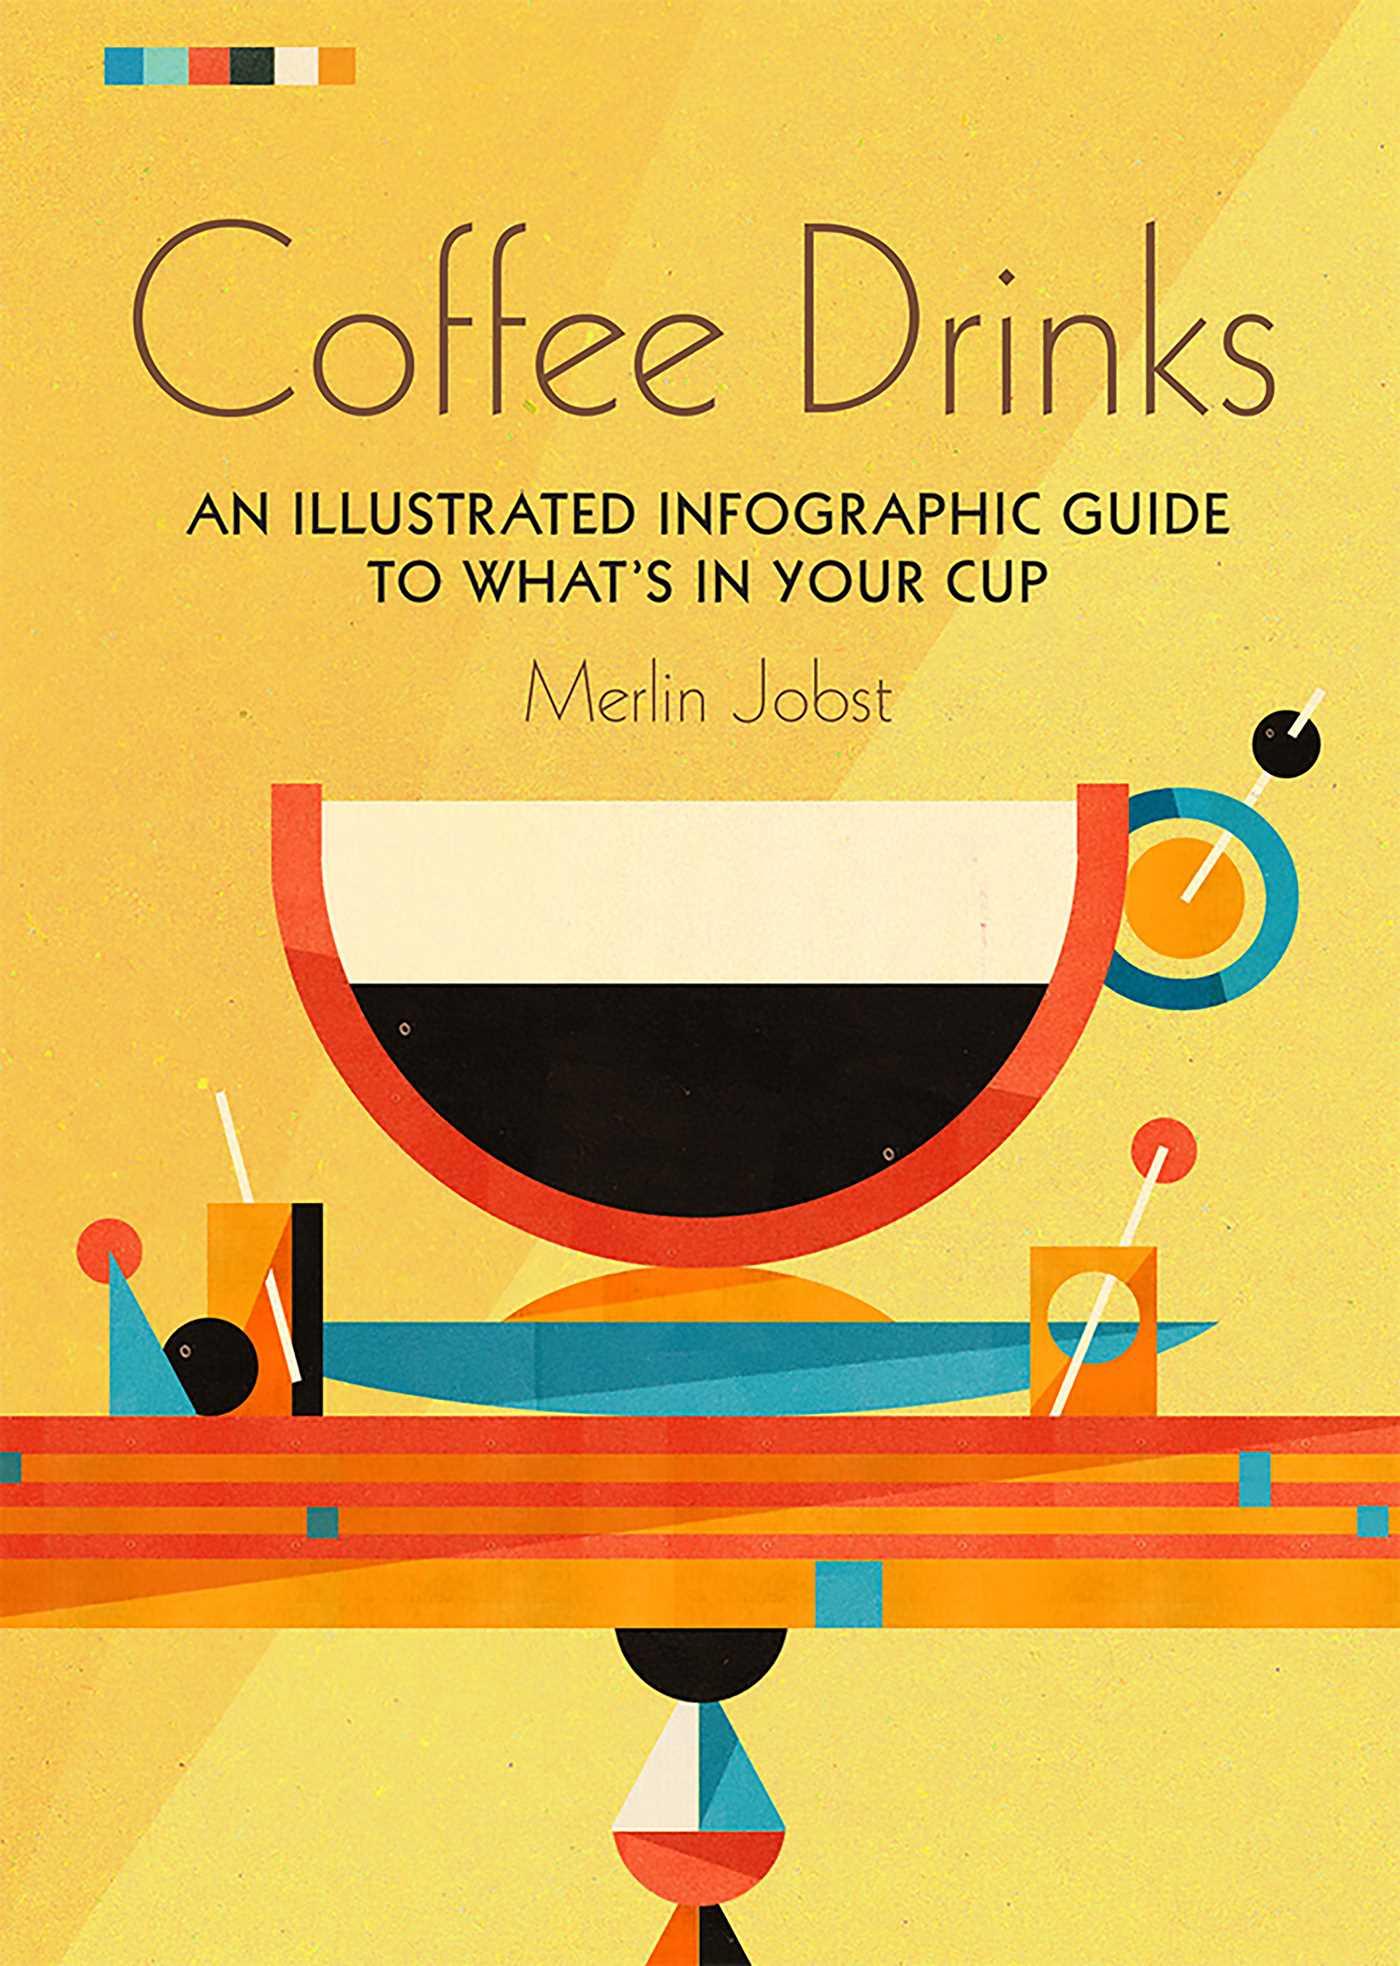 Coffee drinks 9781911026235 hr